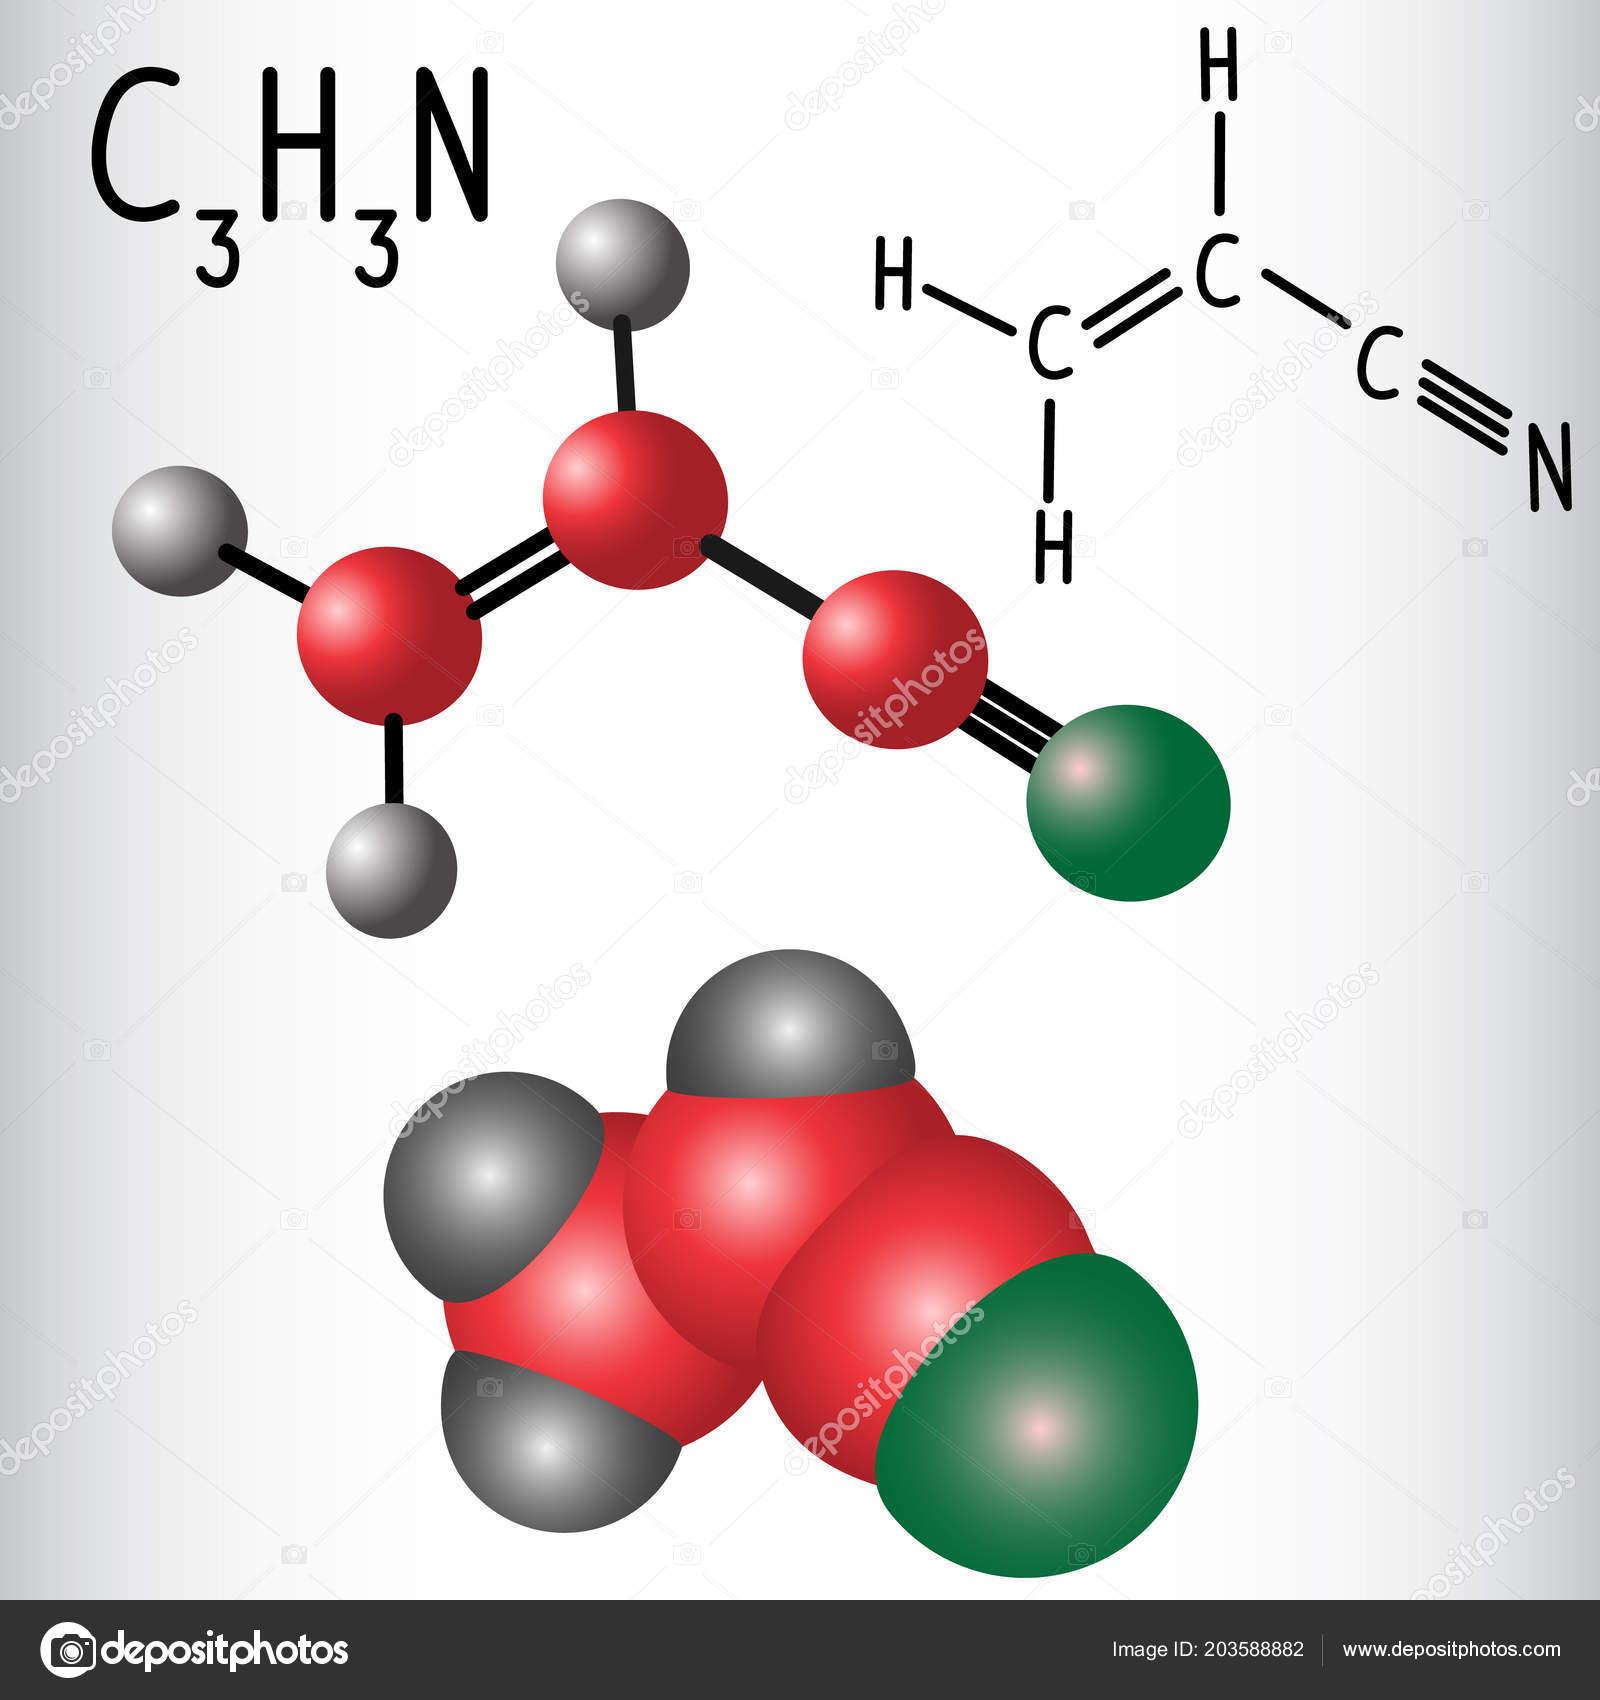 Acrylonitrile Molecule Structural Chemical Formula Model Used